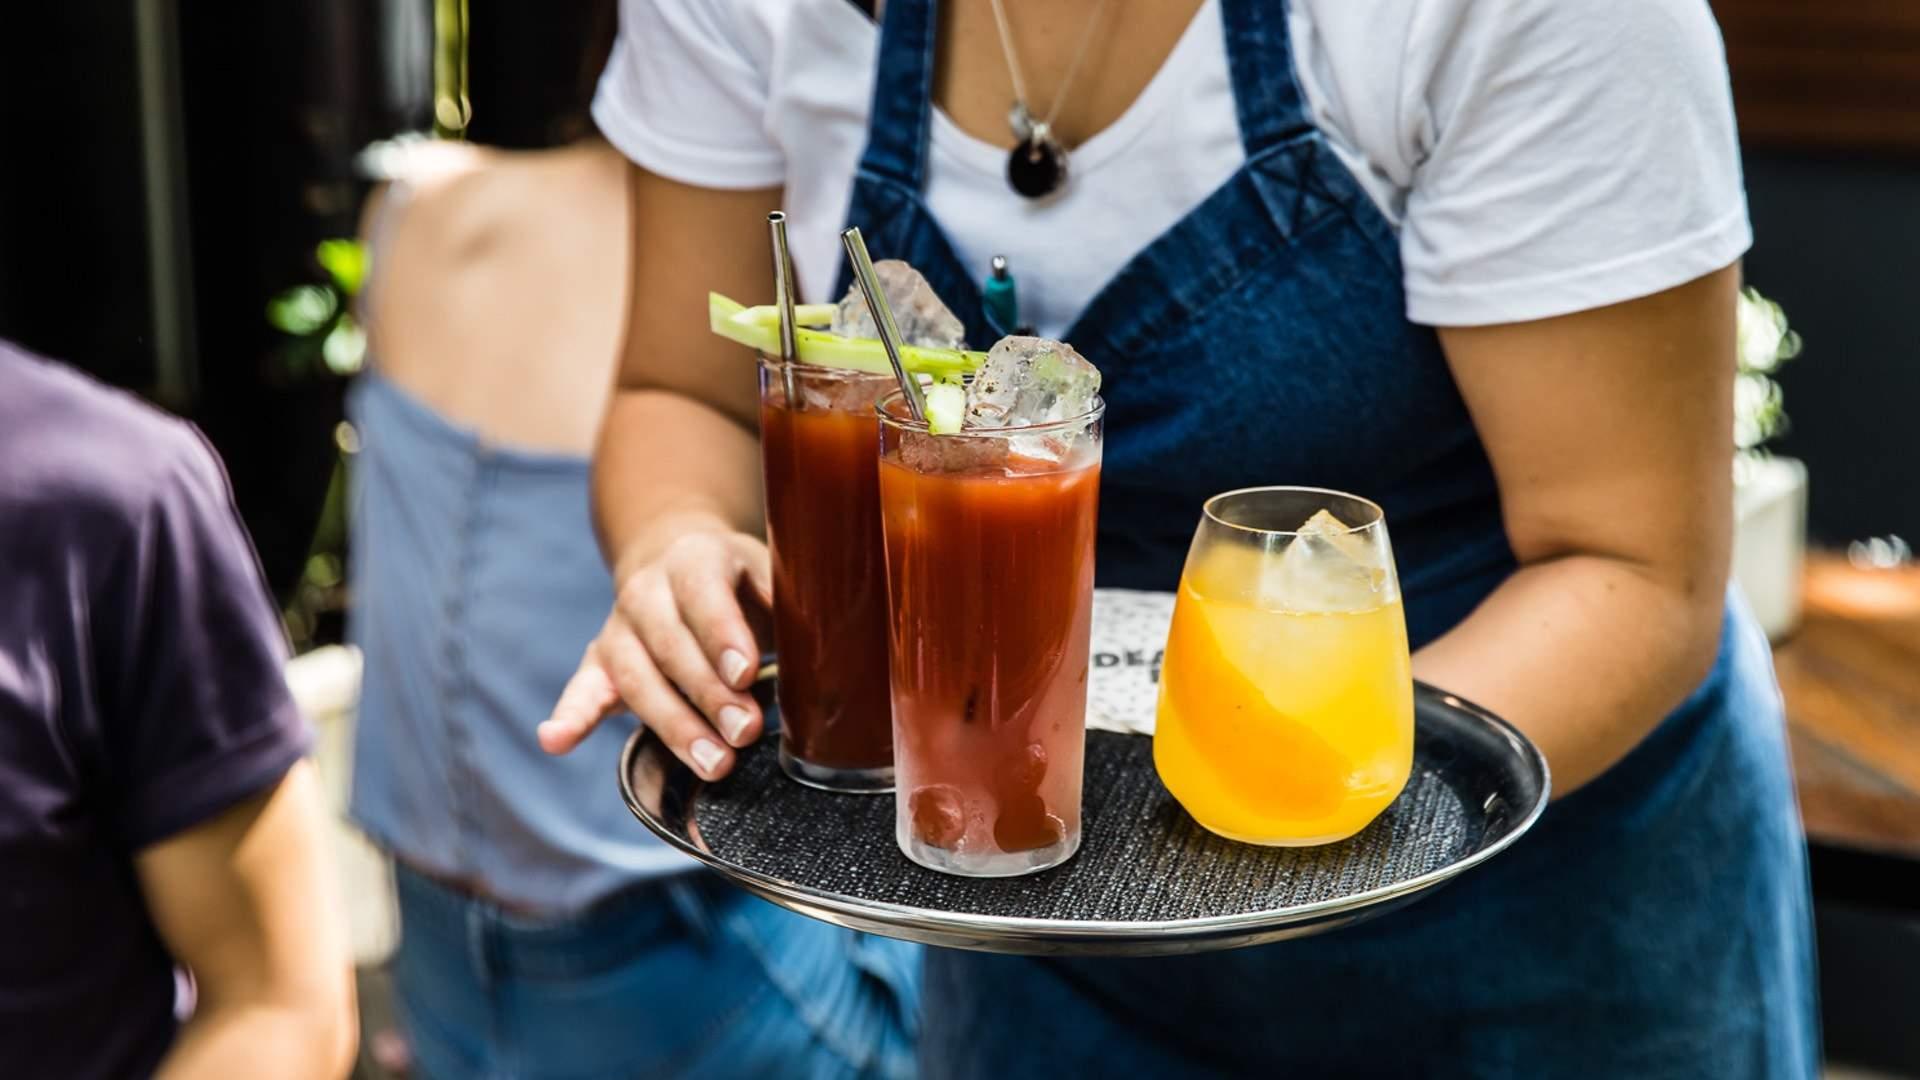 Sydney's Best Spots for a Boozy Bottomless Brunch